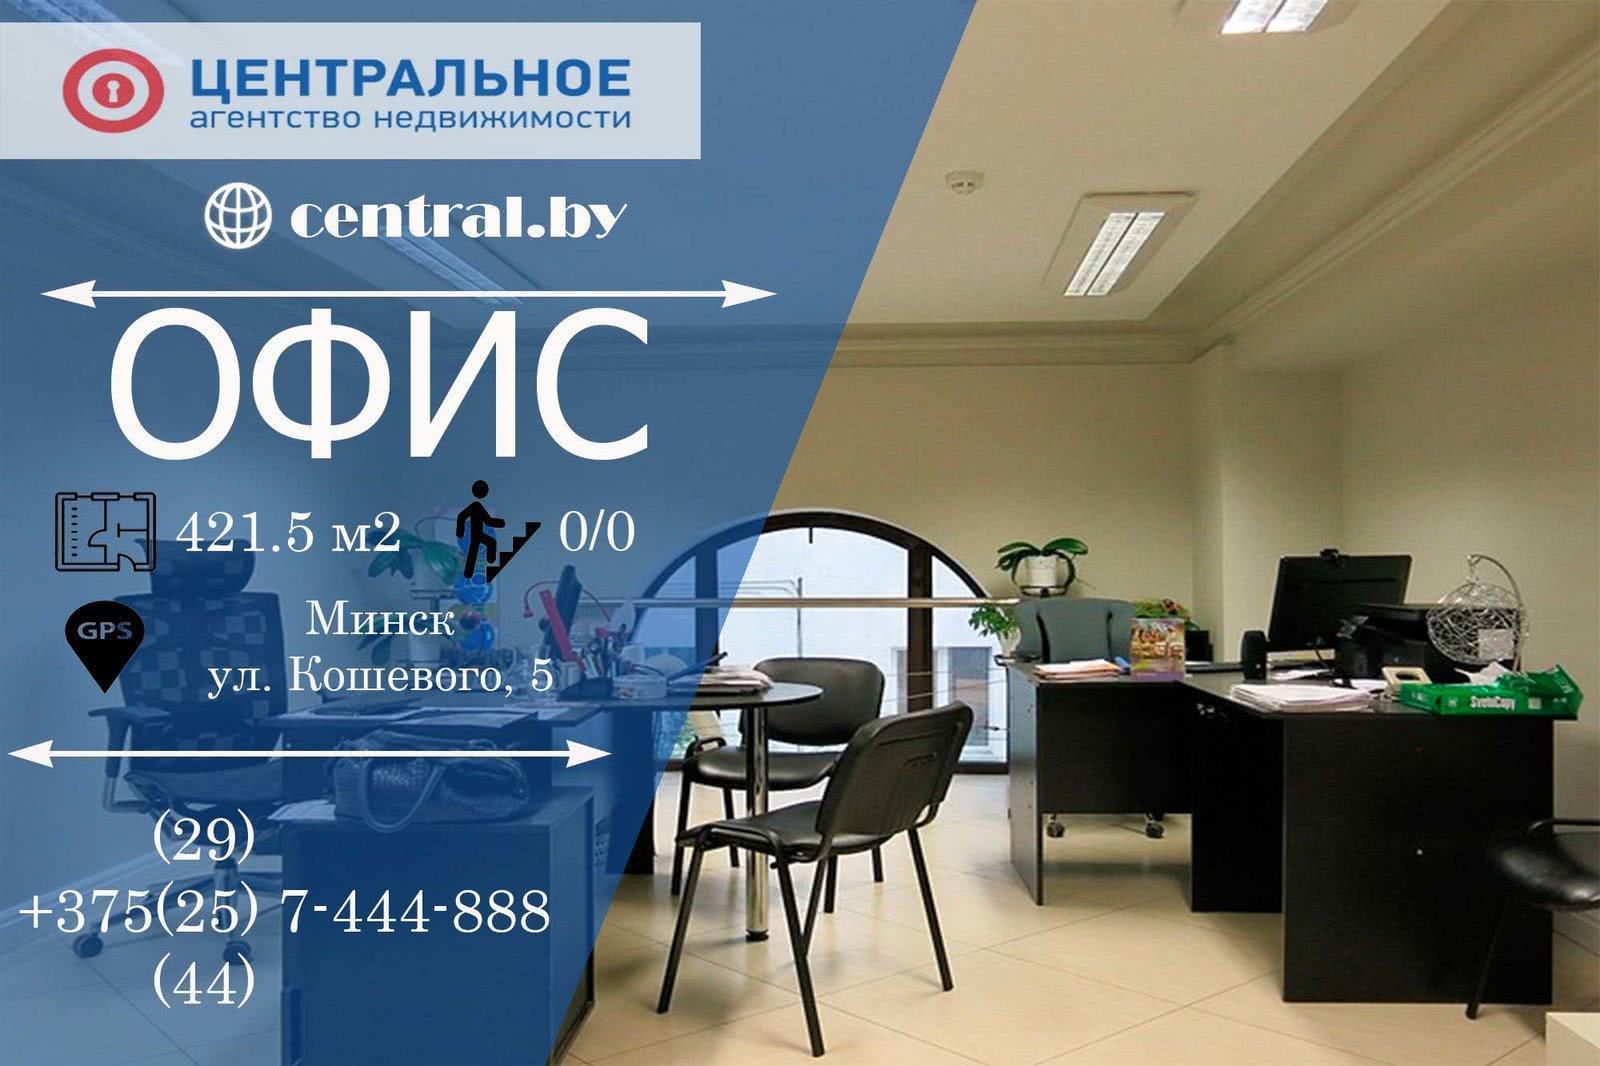 Продажа офиса на ул. Олега Кошевого, д. 5 в Минске - фото 1